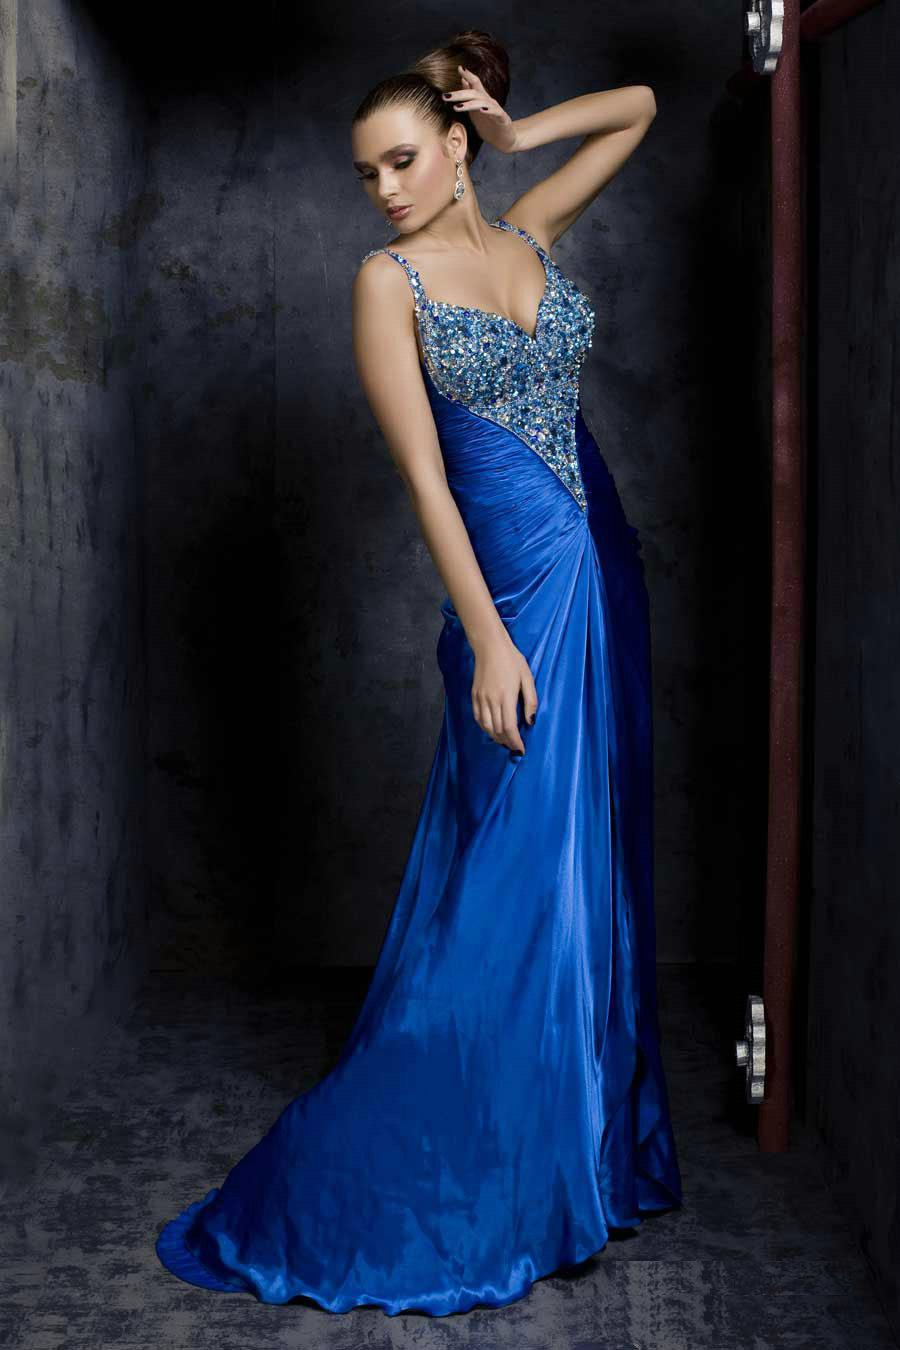 Evening dresses boutique in lebanon